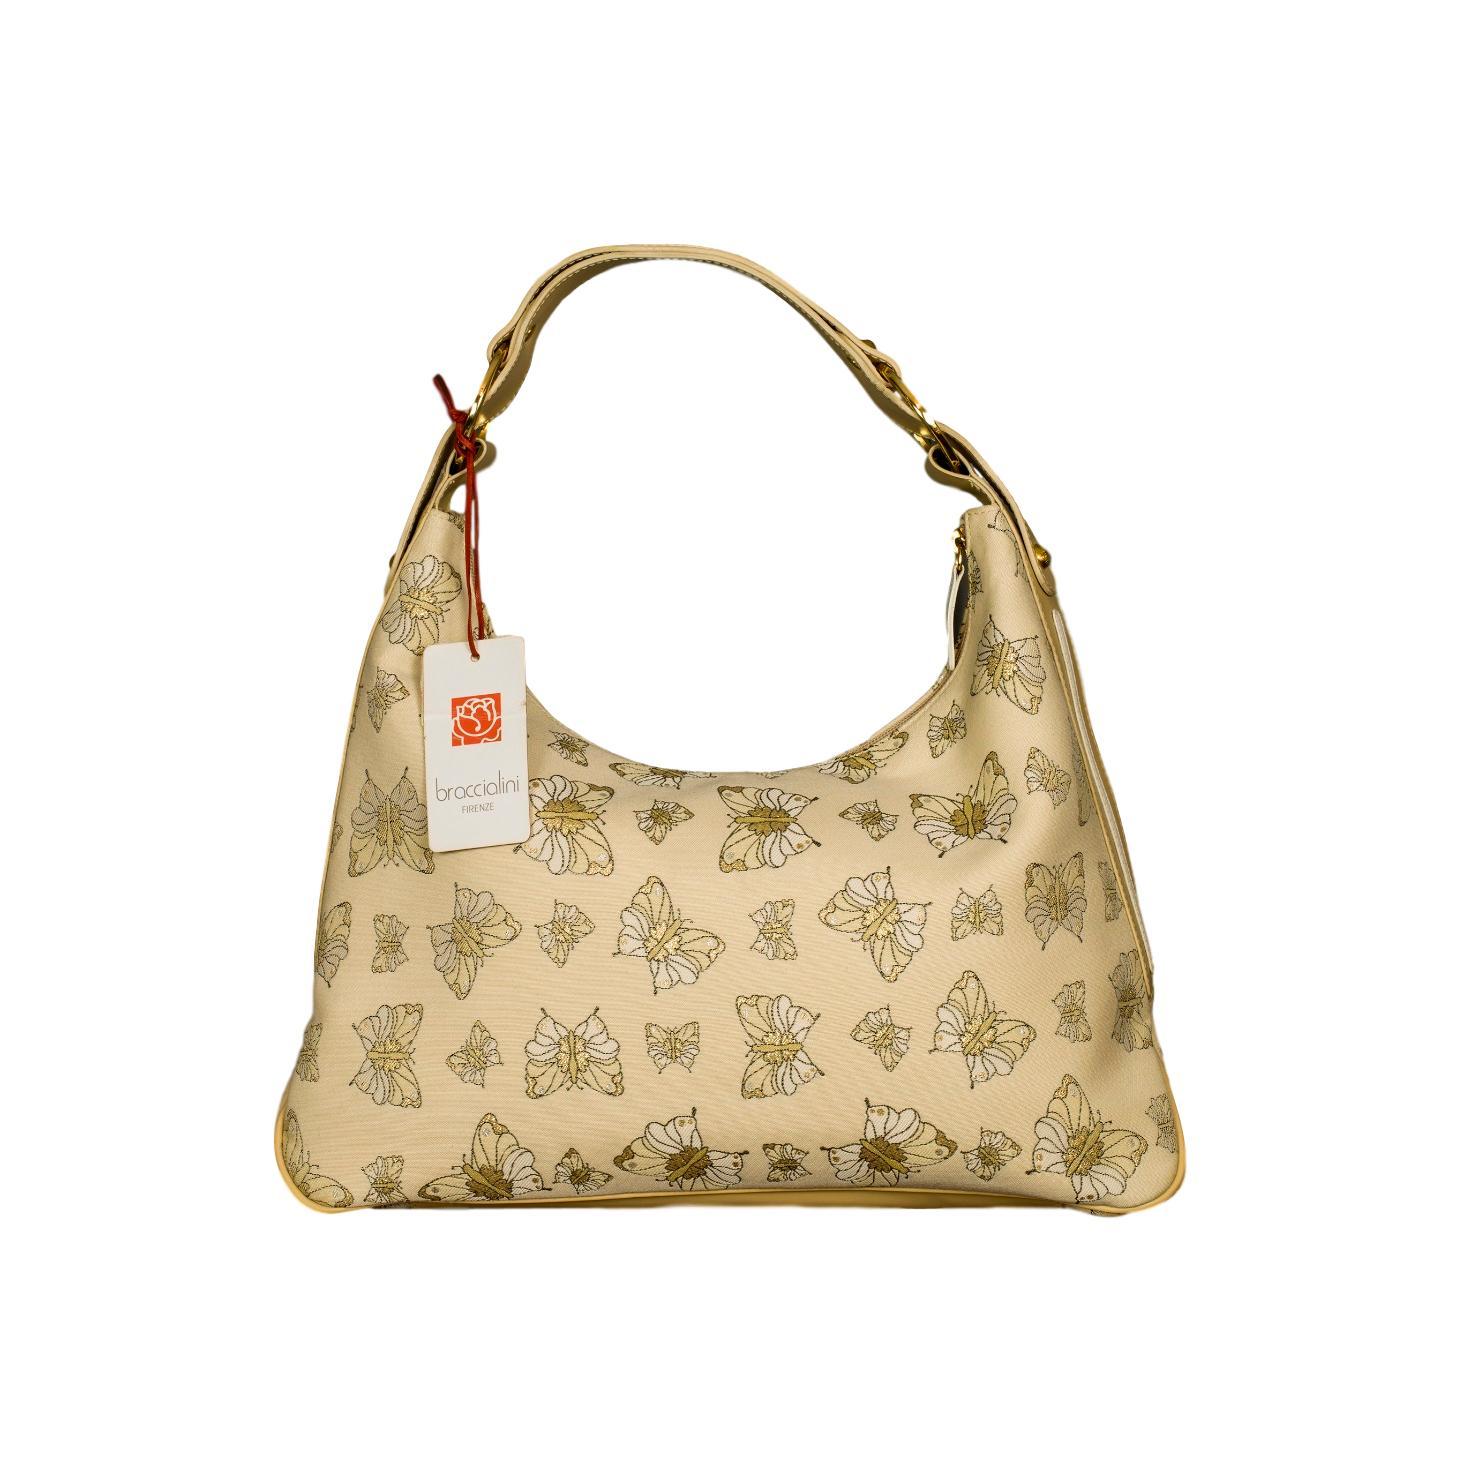 ba1c382db8b6 Купить среднюю сумку Braccialini